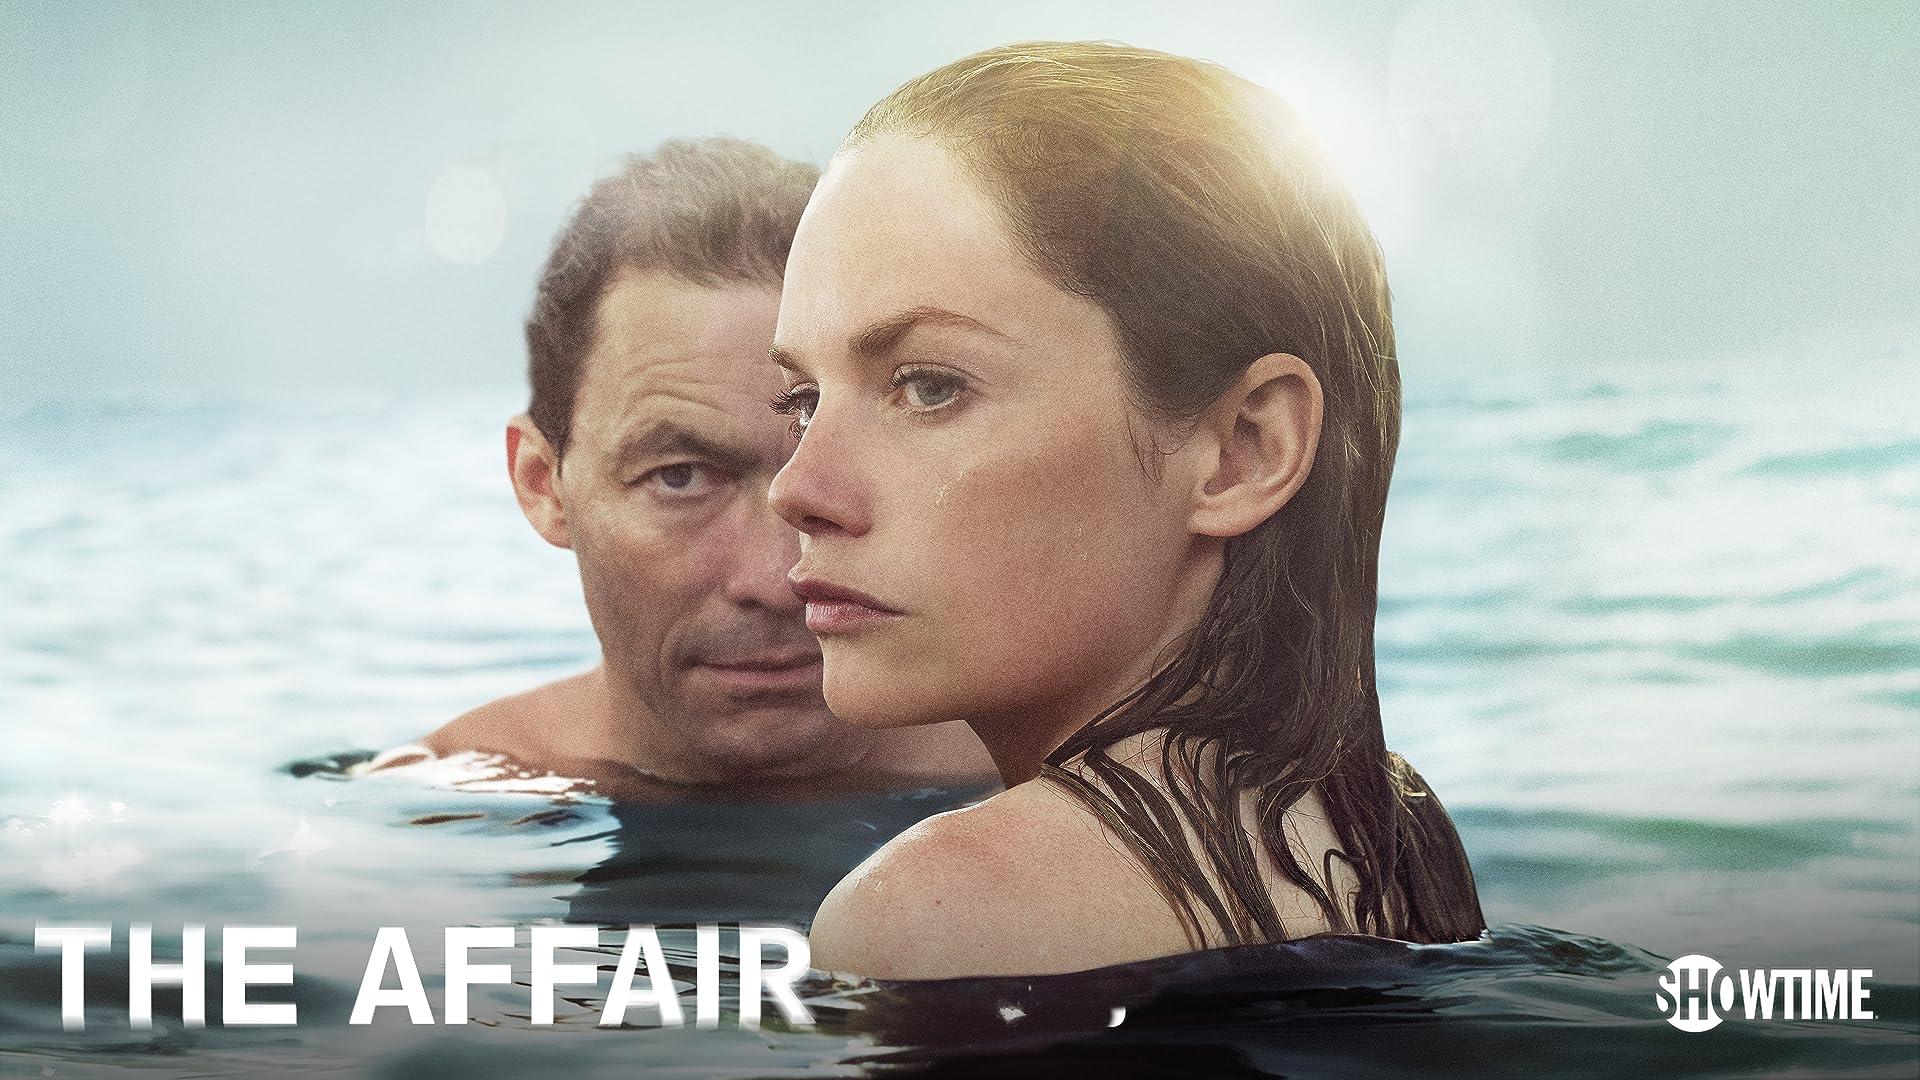 The Affair Season 1